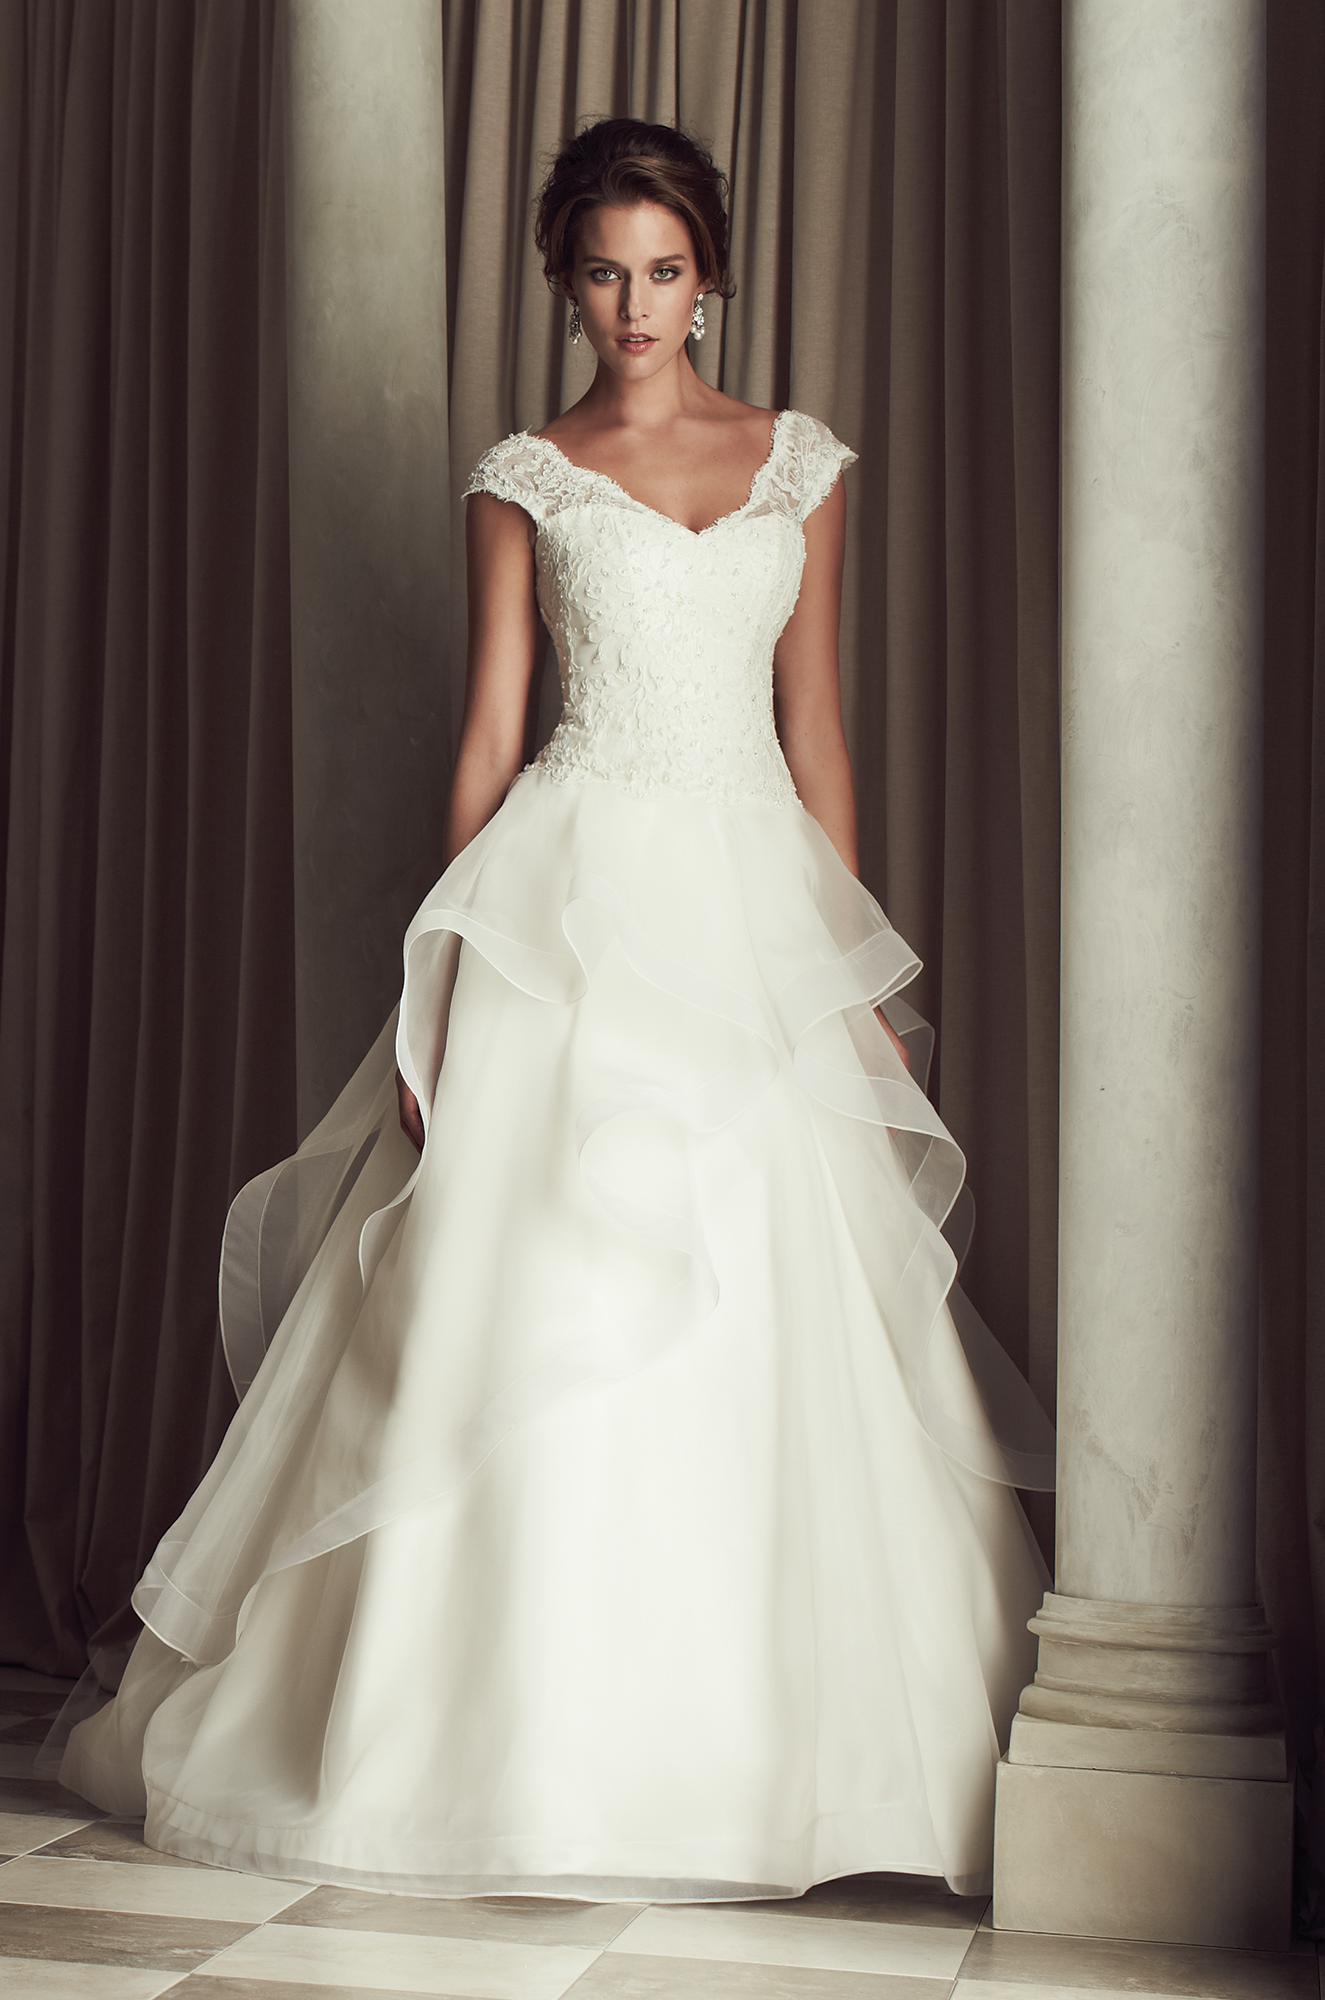 Paloma blanca wedding dresses 2014 vestidos de noiva vestido e divine paloma blanca wedding dresses 2014 collection junglespirit Image collections